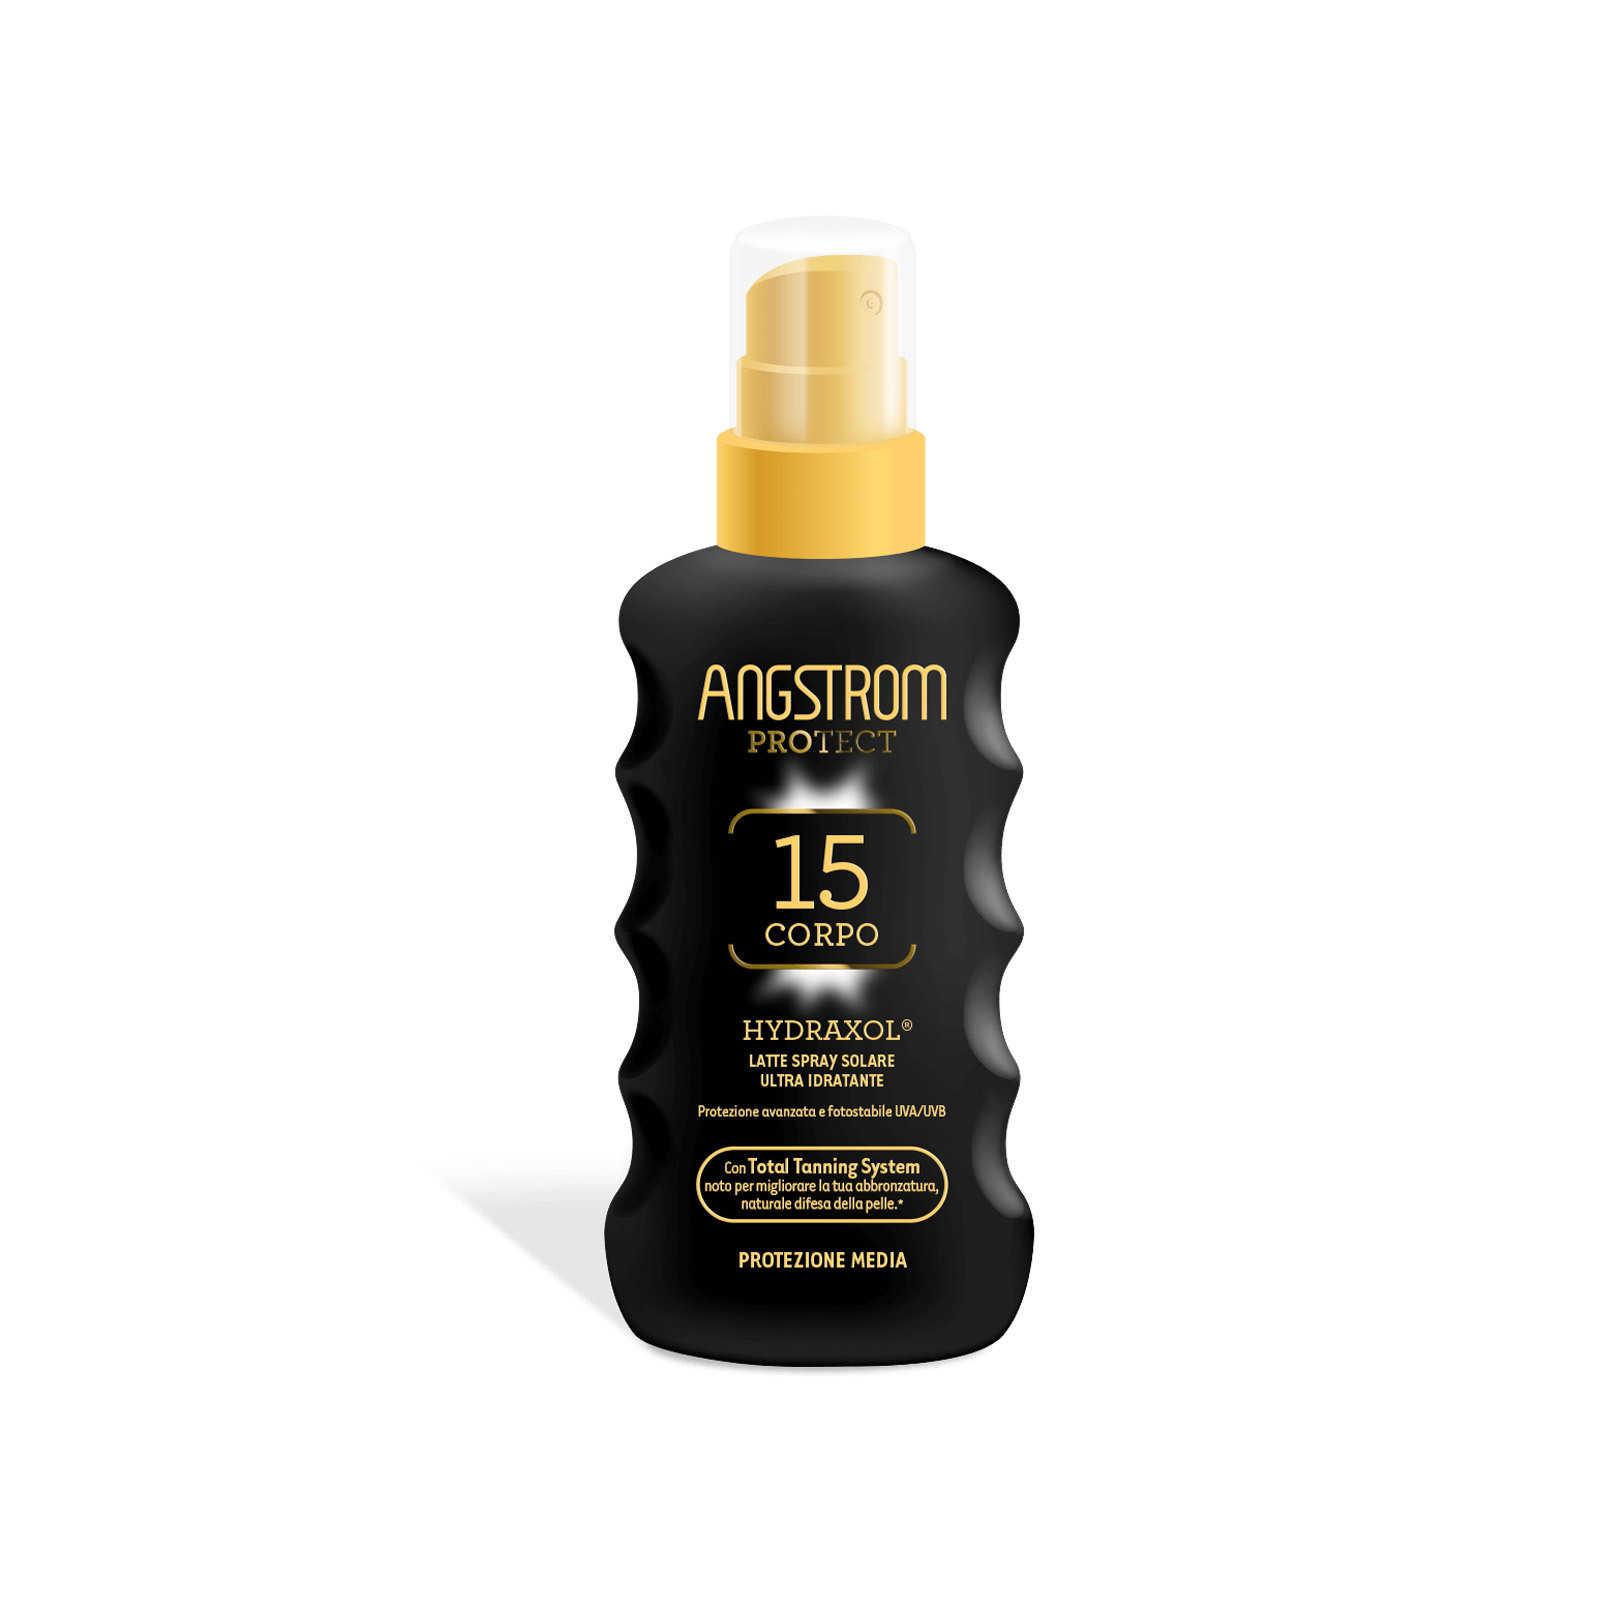 Angstrom - Hydraxol - Latte Solare Spray SPF15